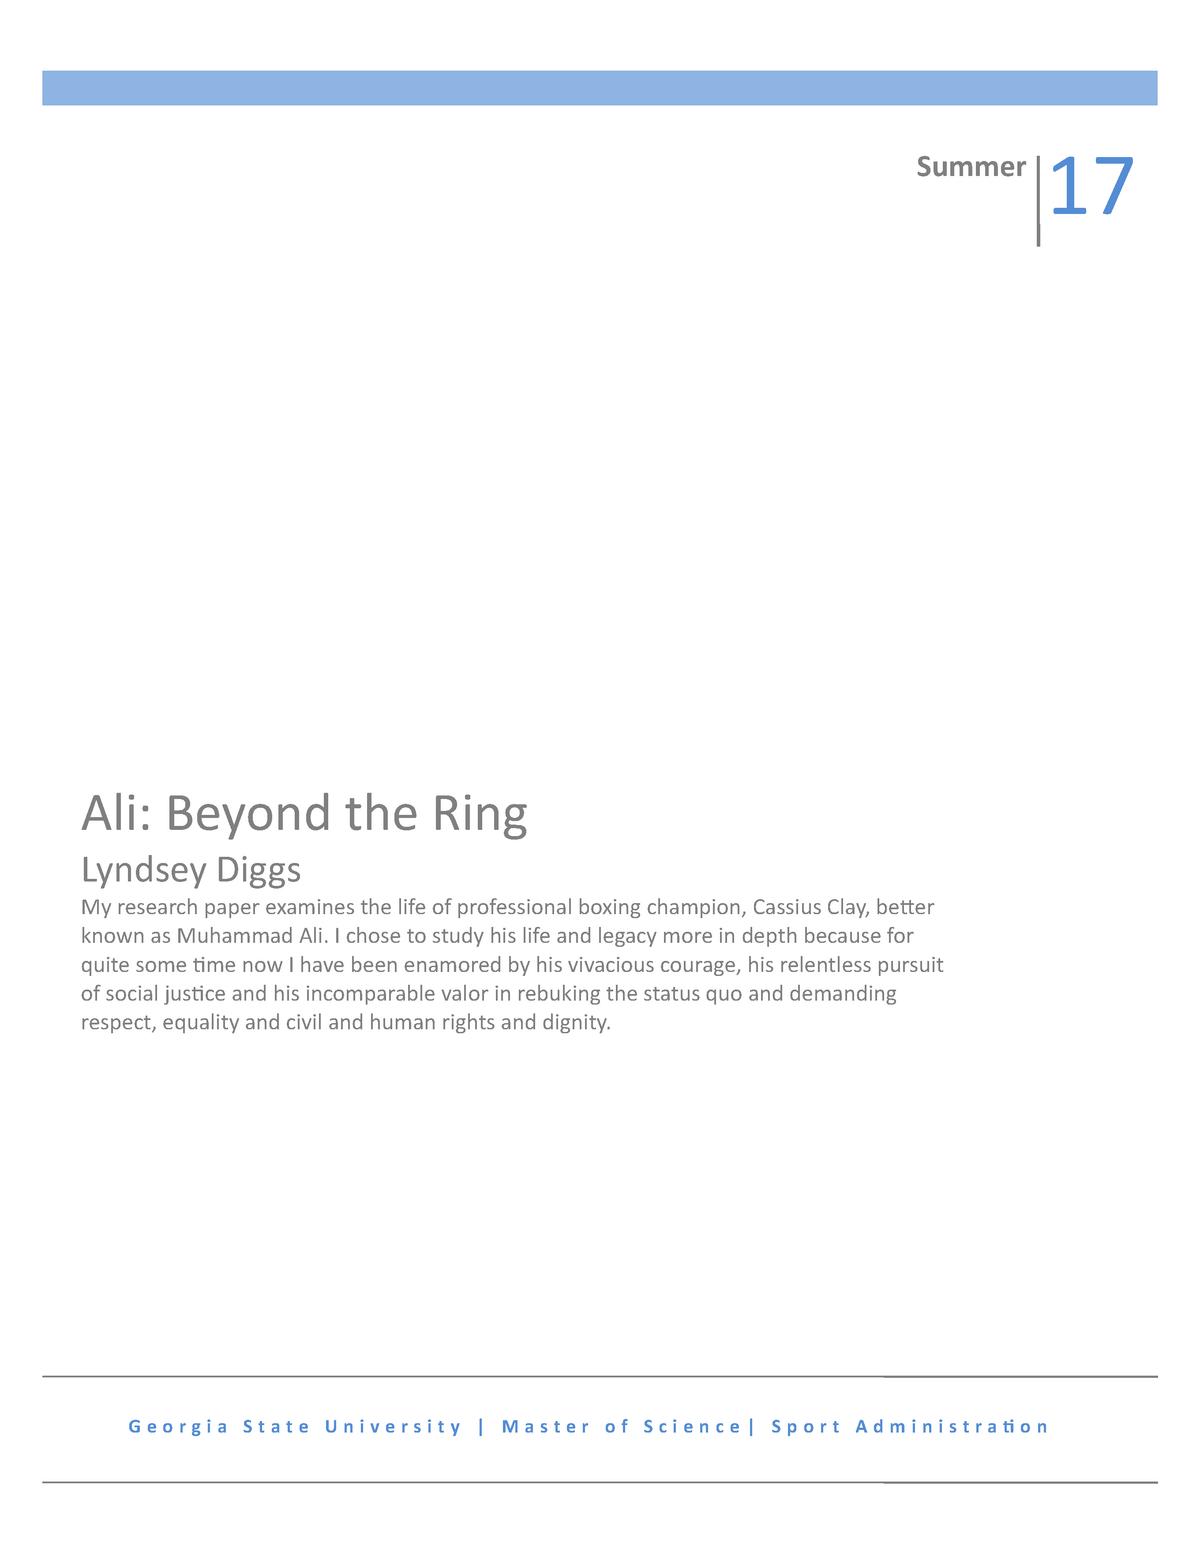 Muhammad ali research paper international marketing essay